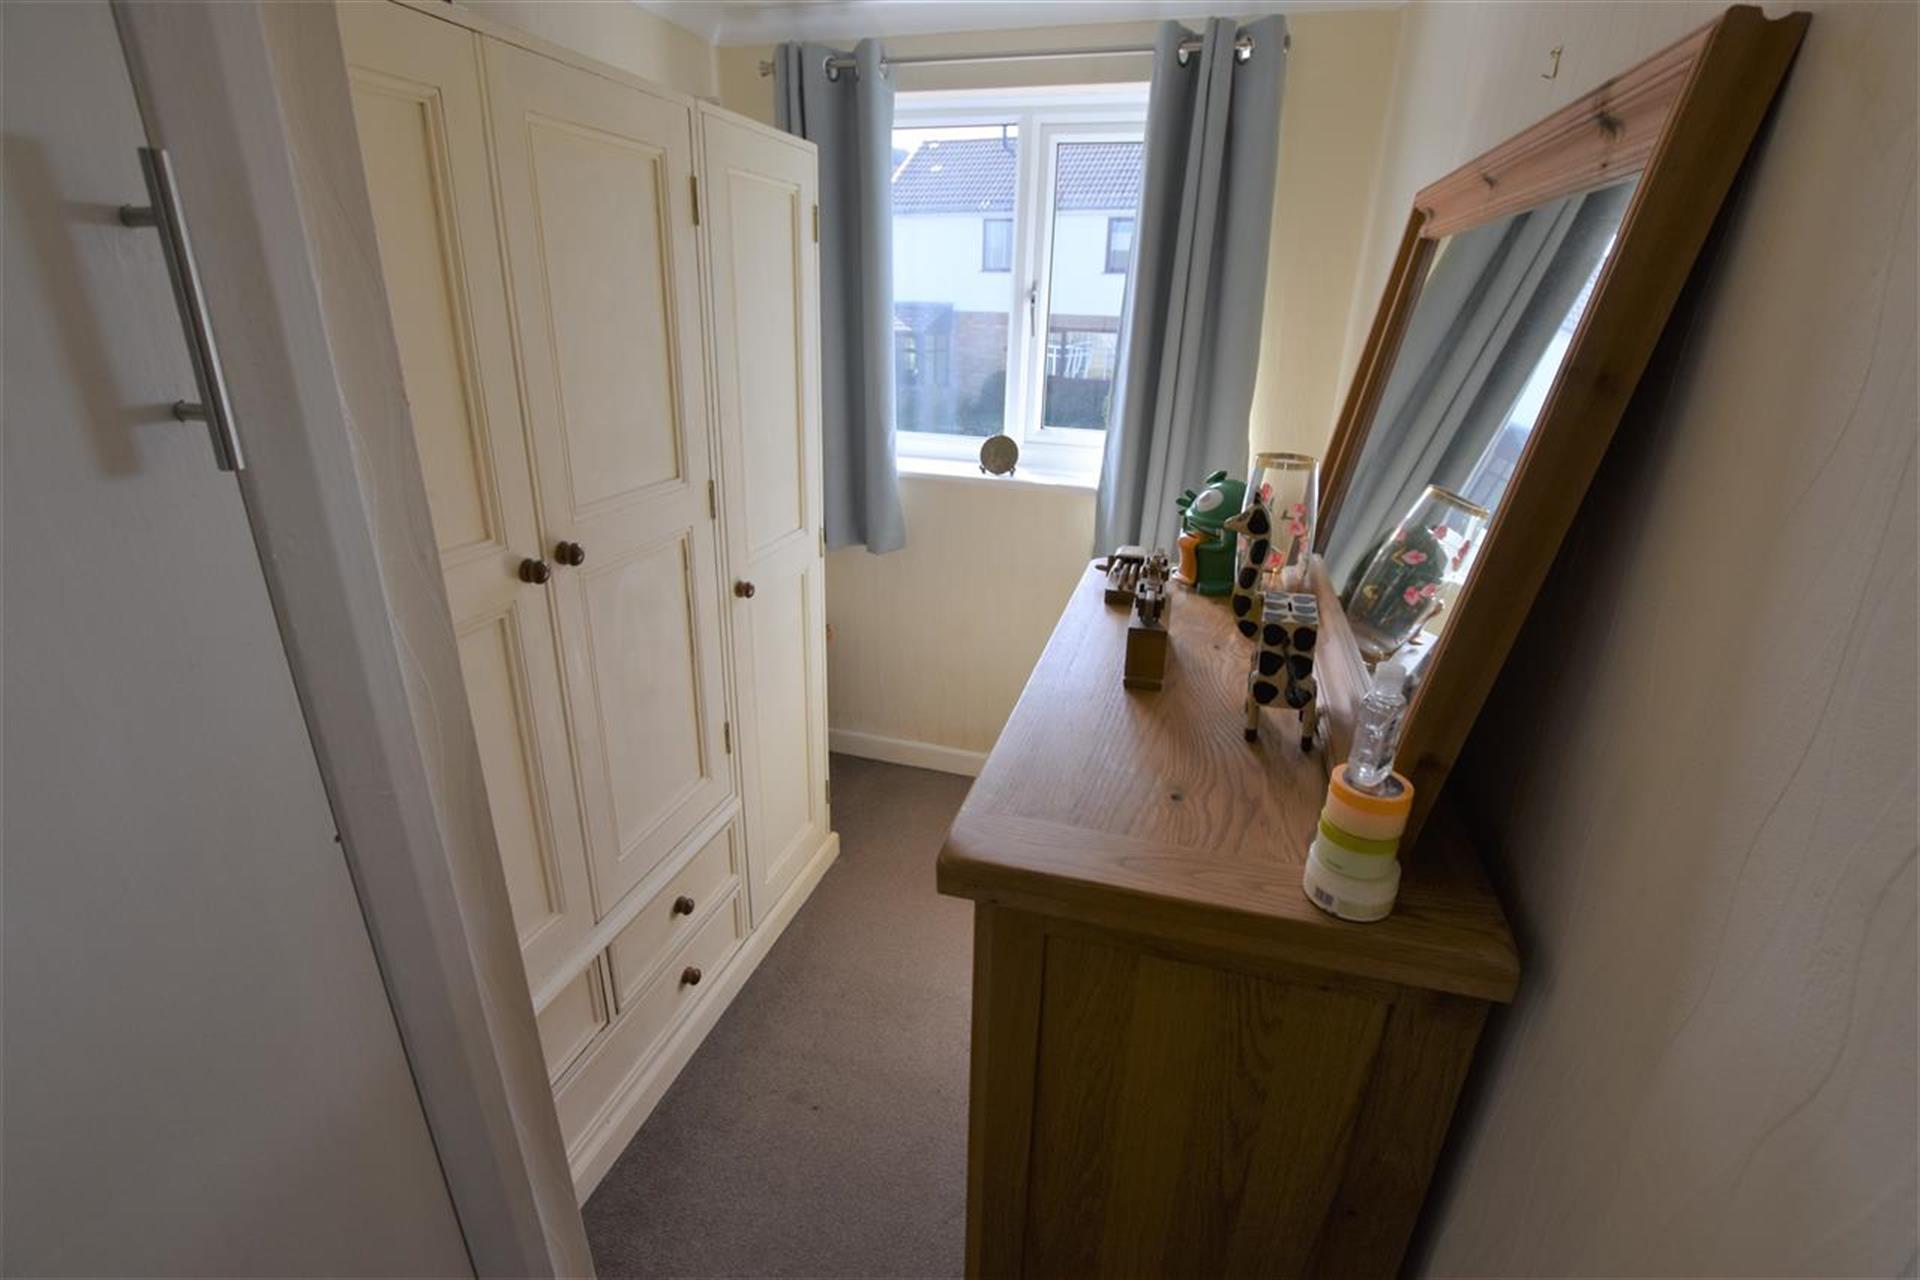 3 Bedroom Semi-detached House For Sale - Third Bedroom